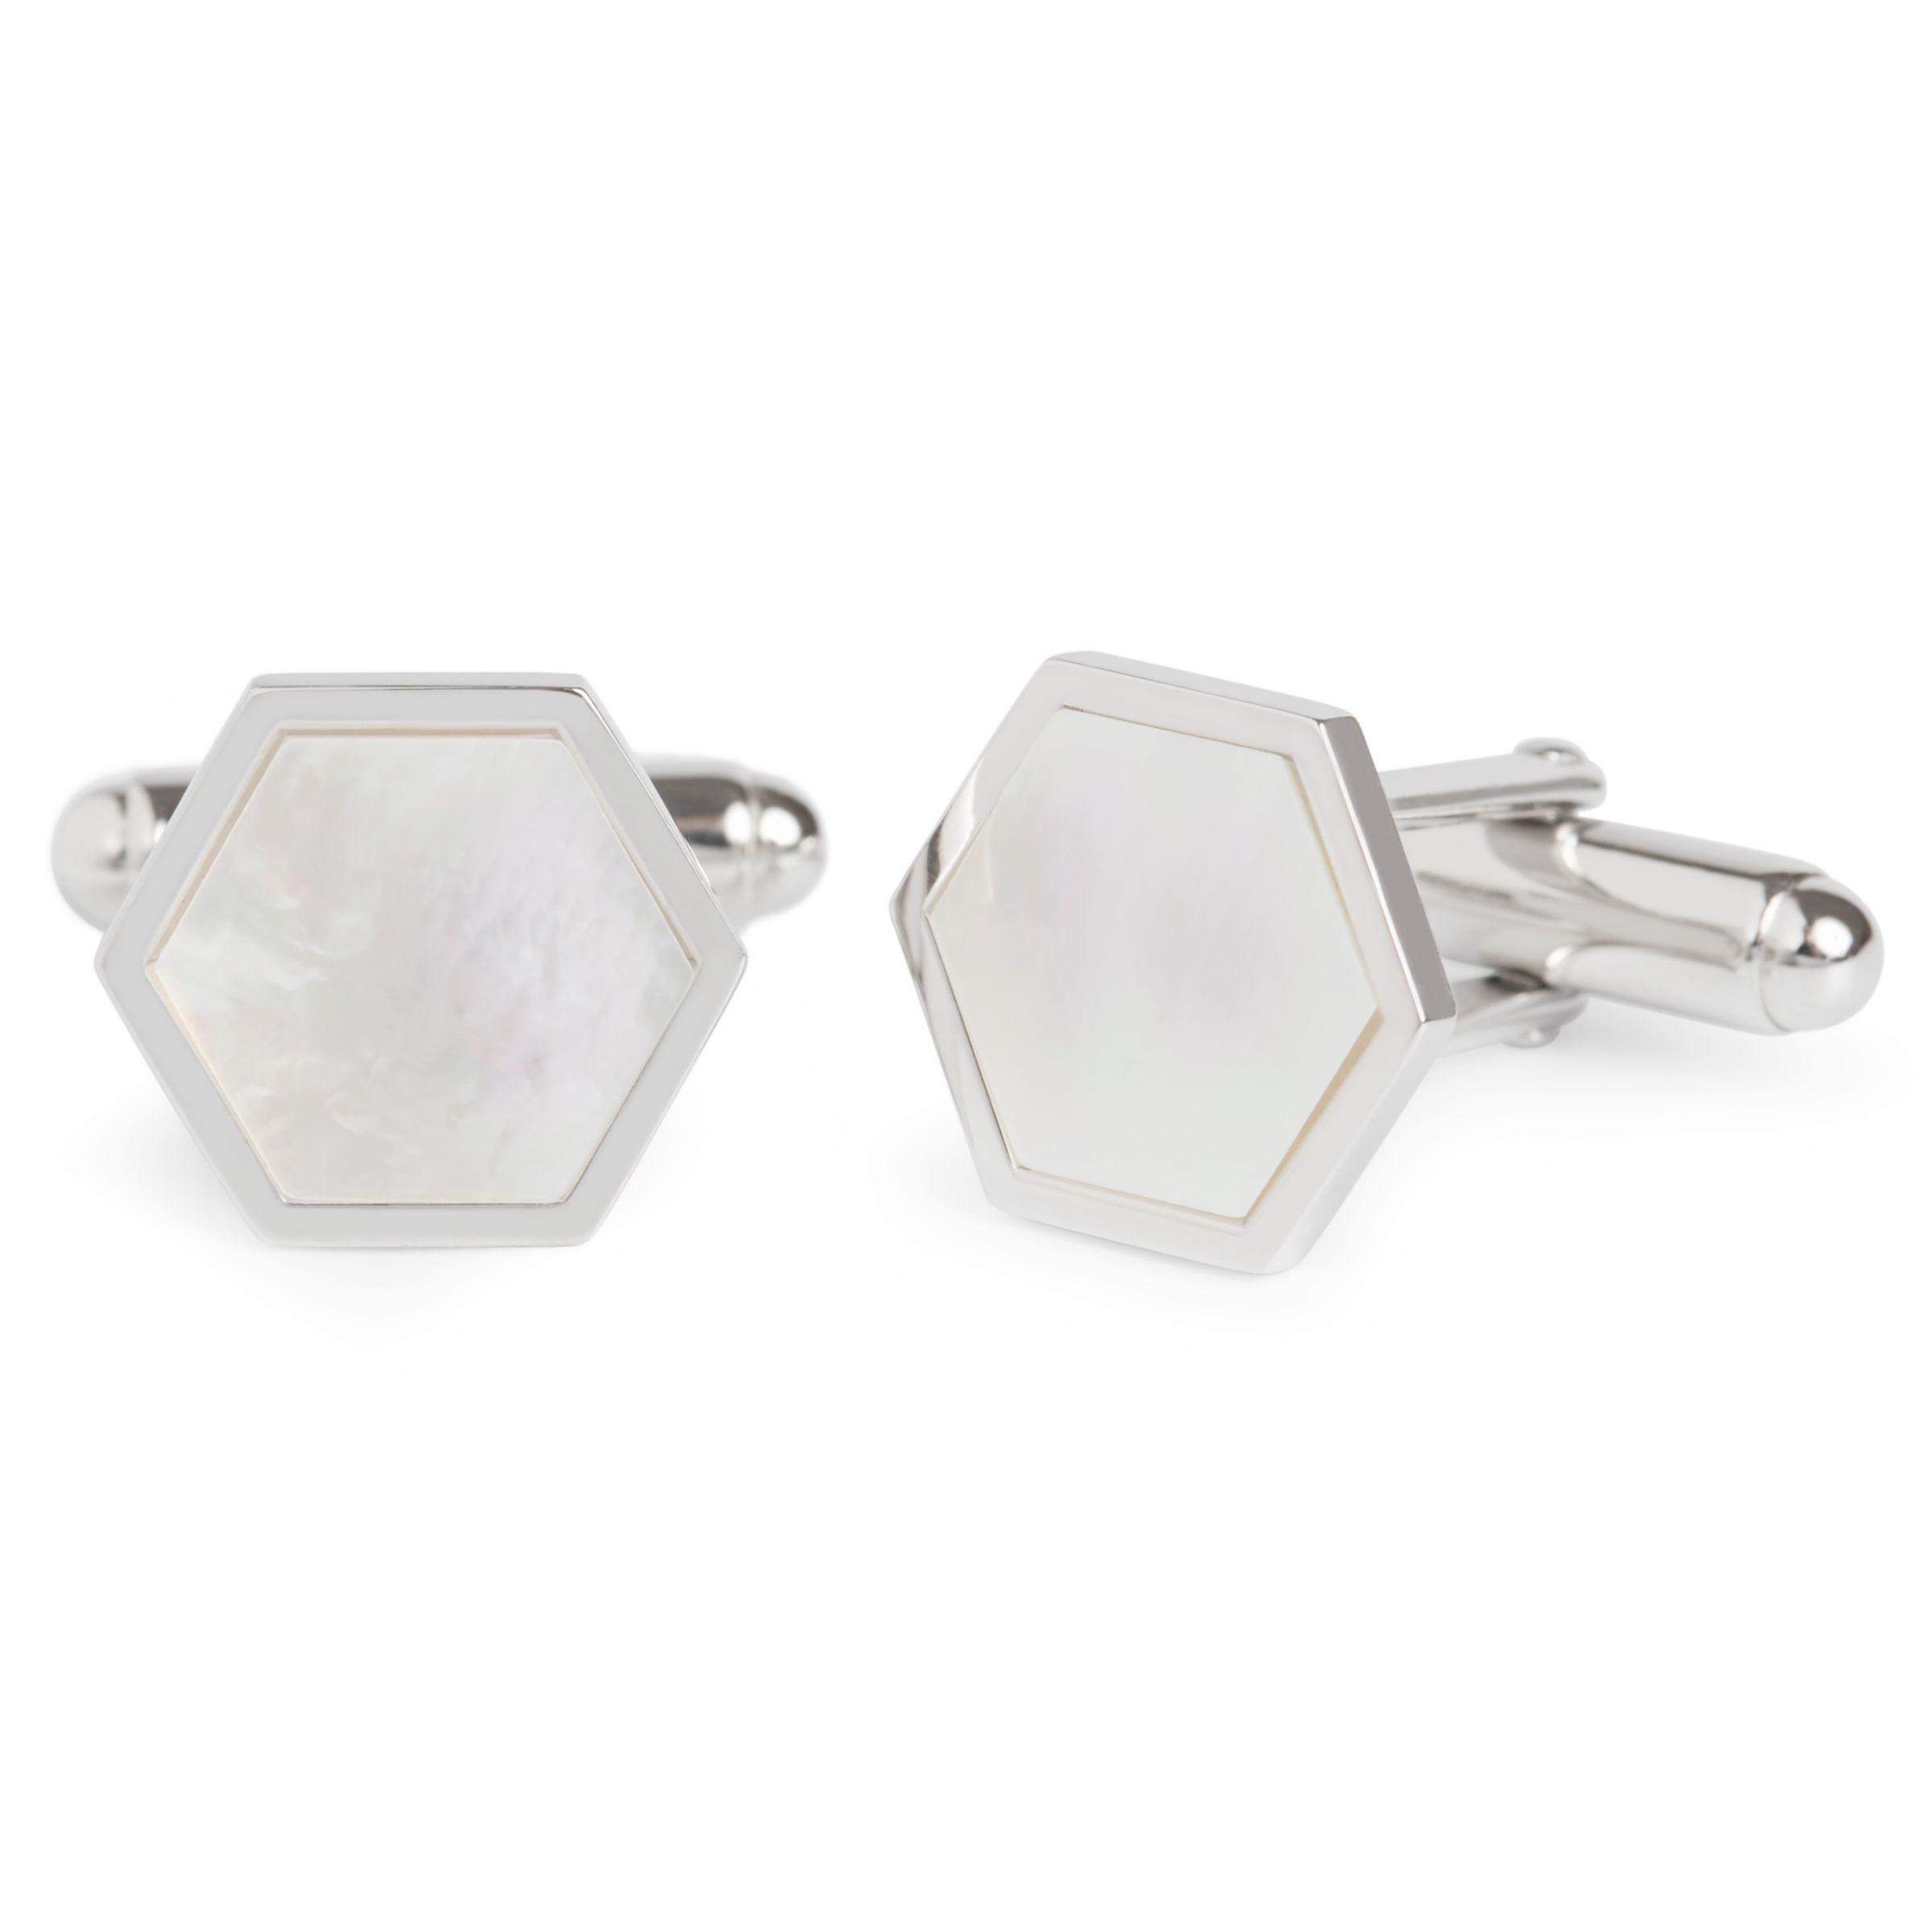 Simon Carter Simon Carter for John Lewis Hexagonal Sterling Silver Mother of Pearl Cufflinks, Silver